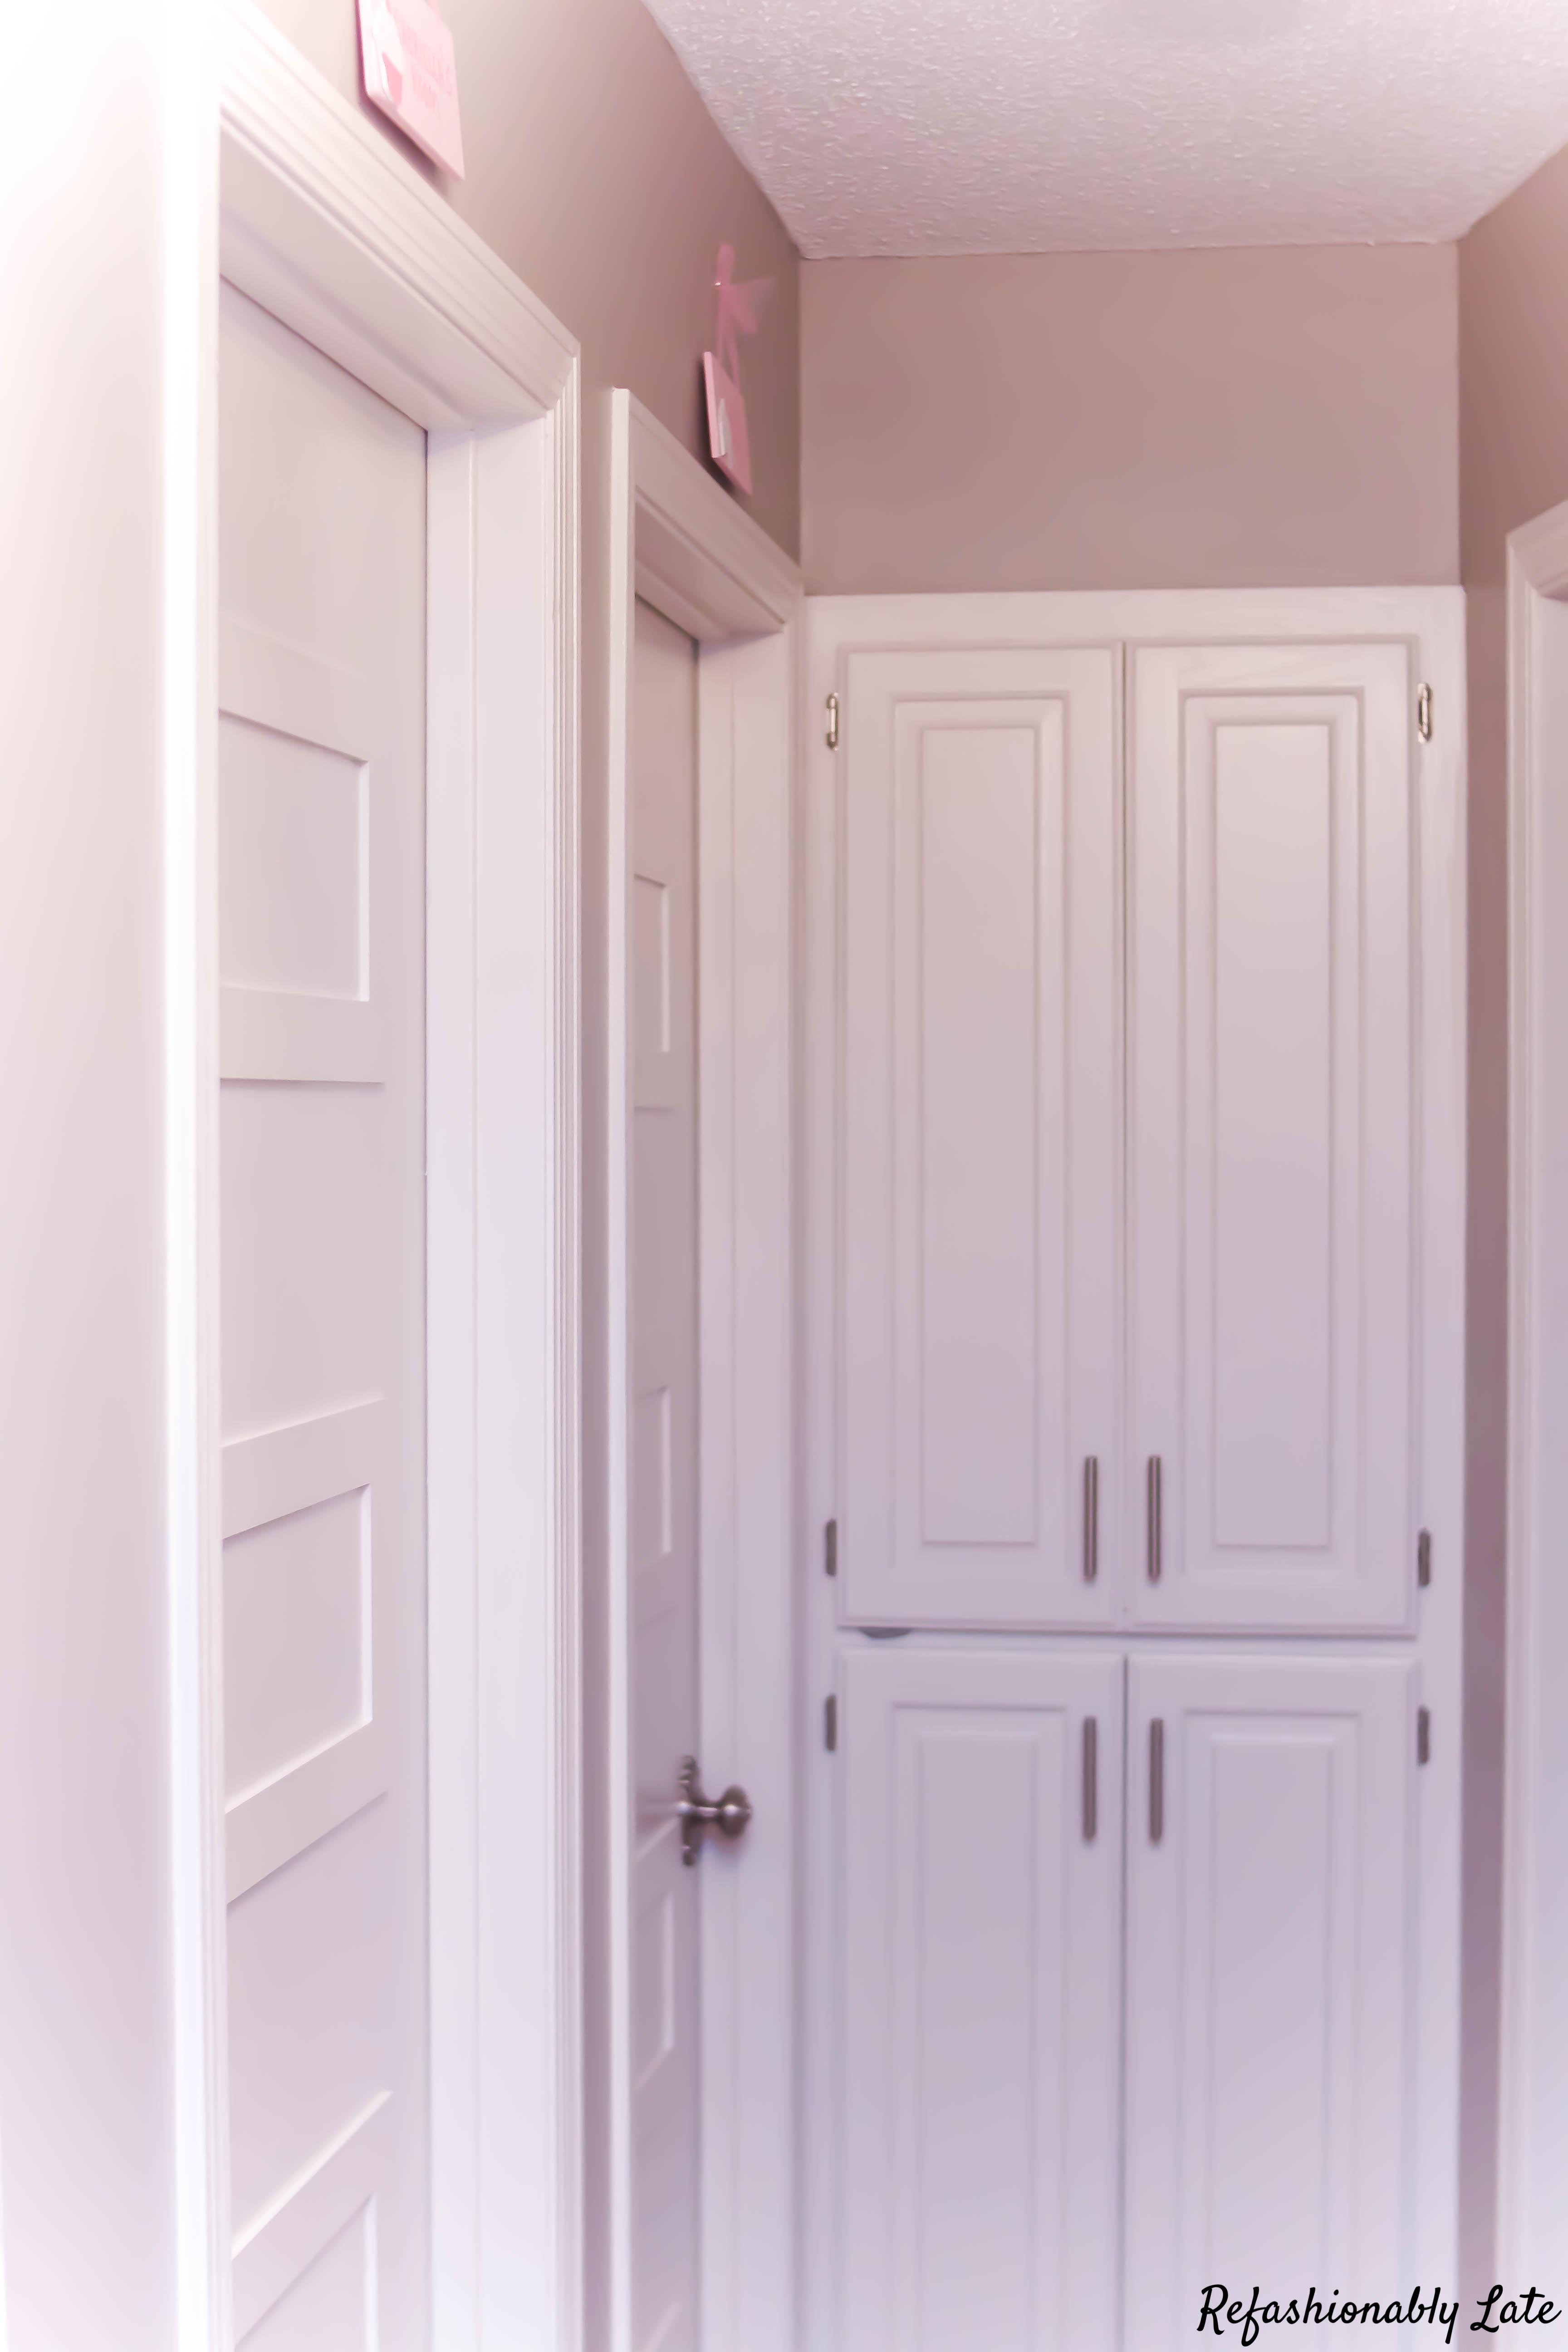 Hollow Core Door Makeover - www.refashionablylate.com